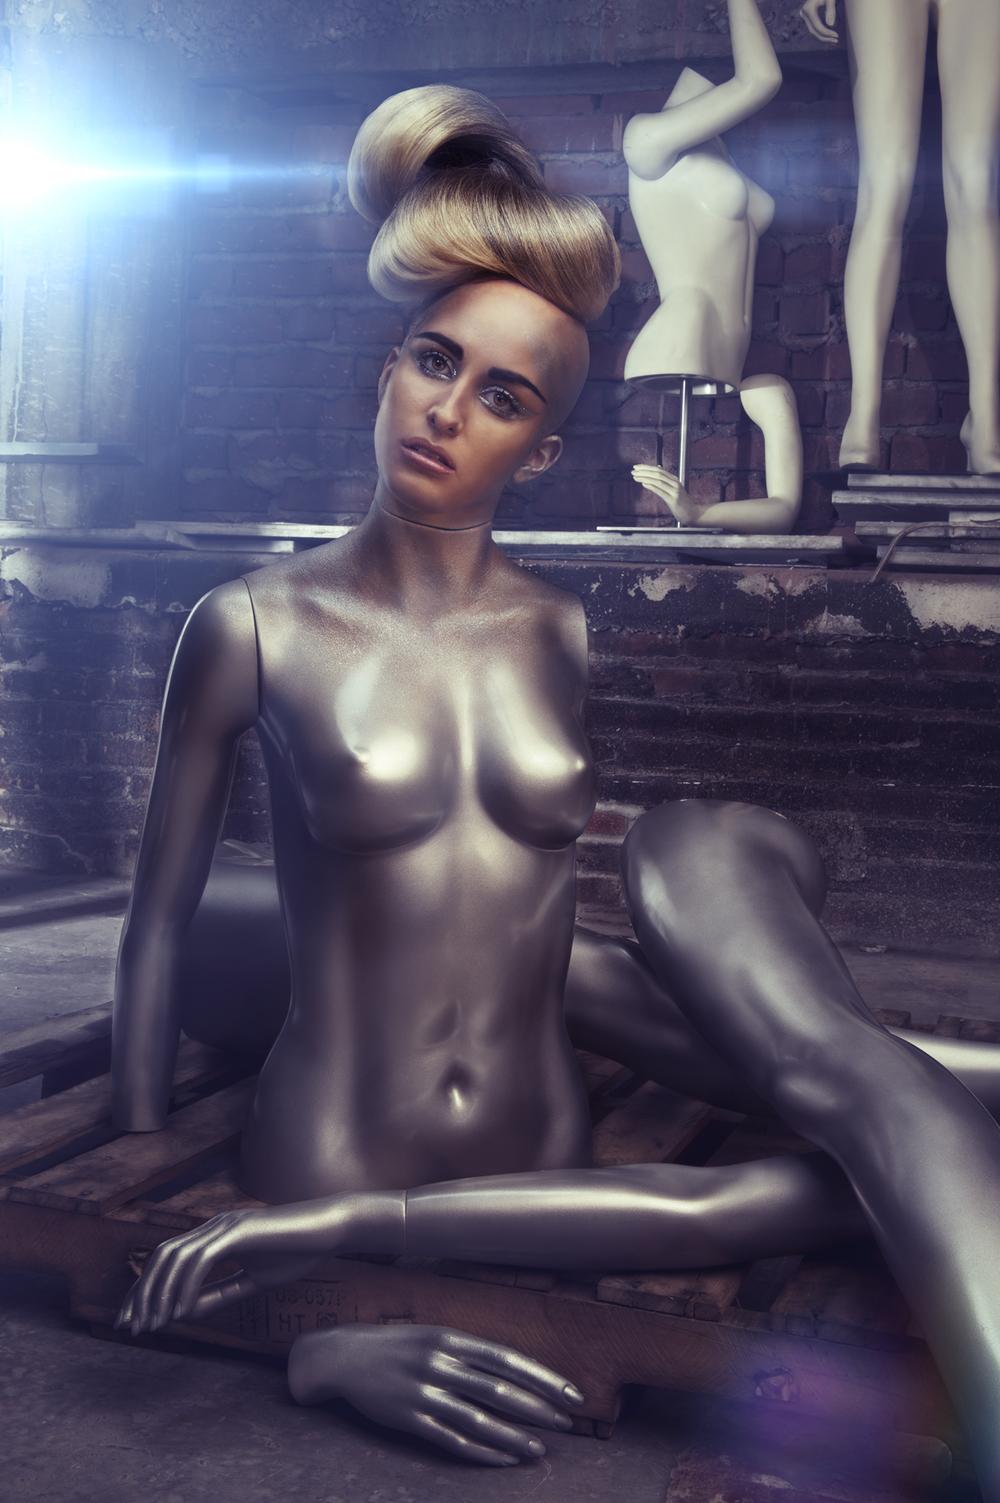 mannequin4-final011311 copy.jpg